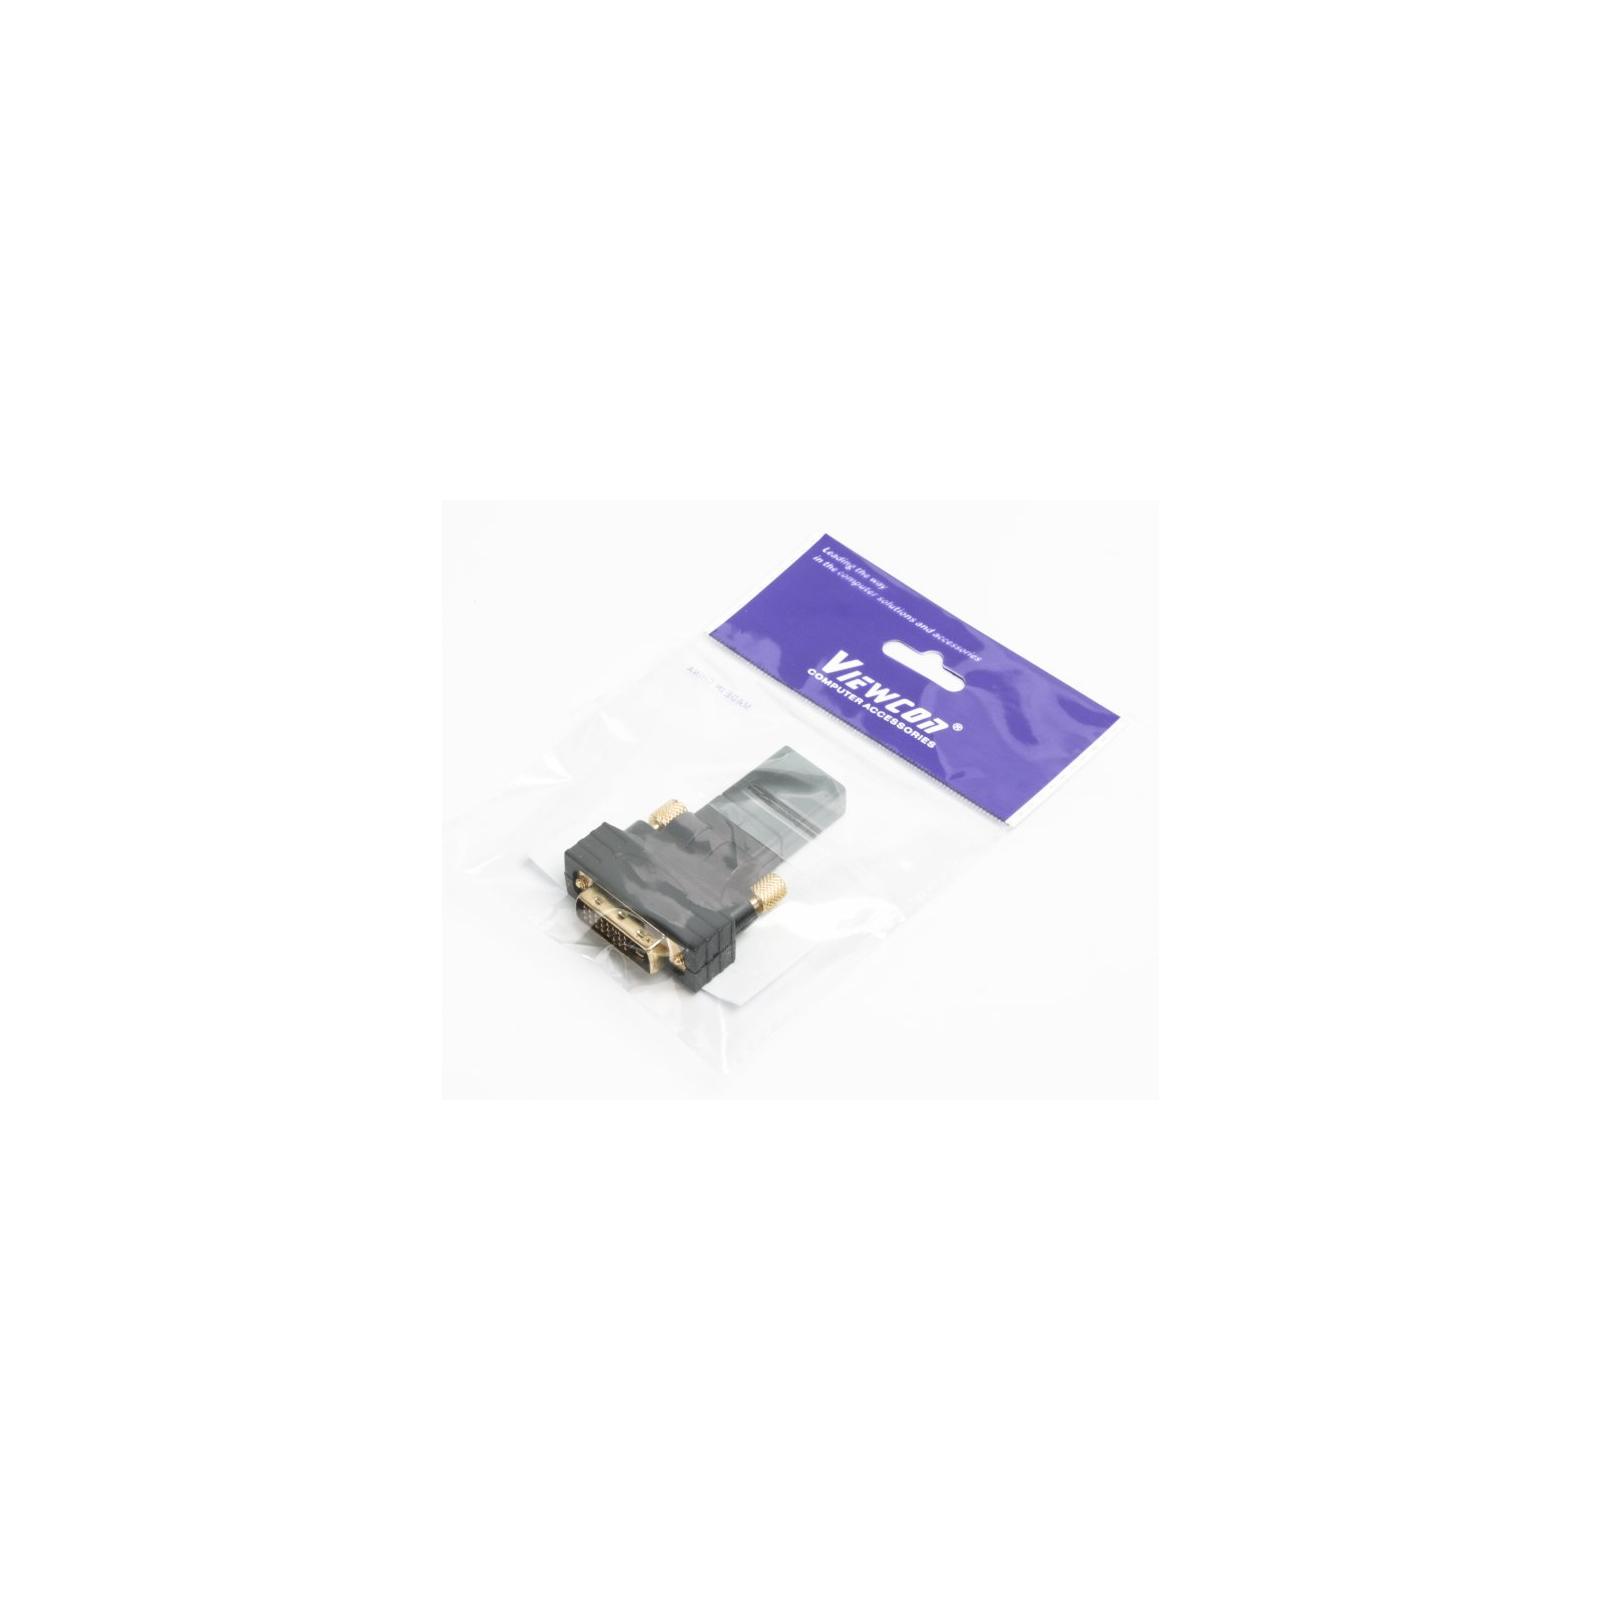 Переходник HDMI AF to DVI M (24+1) Viewcon (VD 038 B) изображение 4